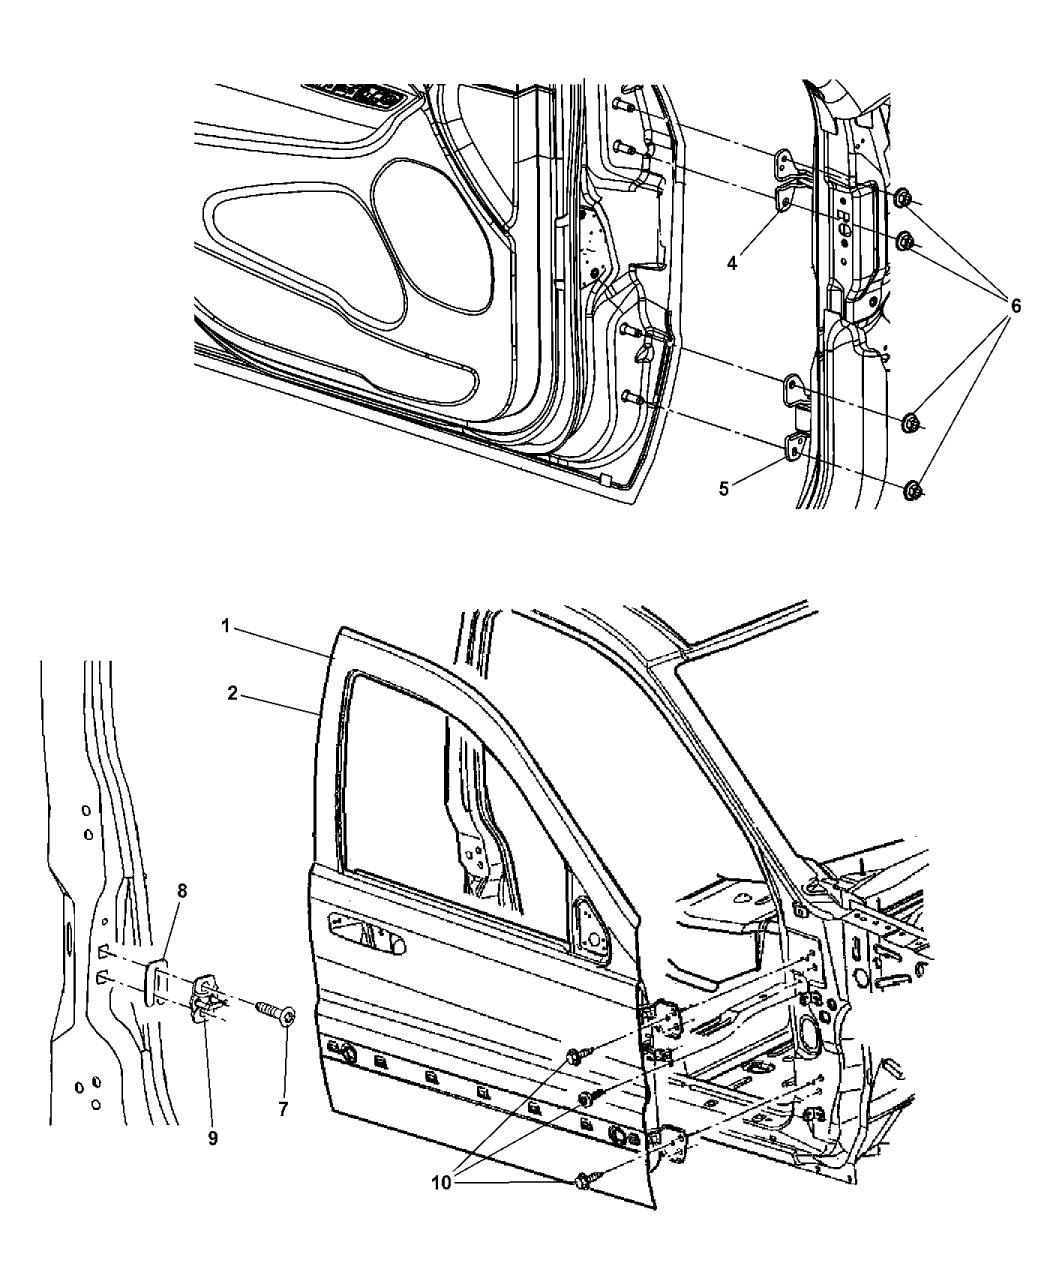 2014 Dodge Durango Front Door, Shell & Hinges - Mopar Parts